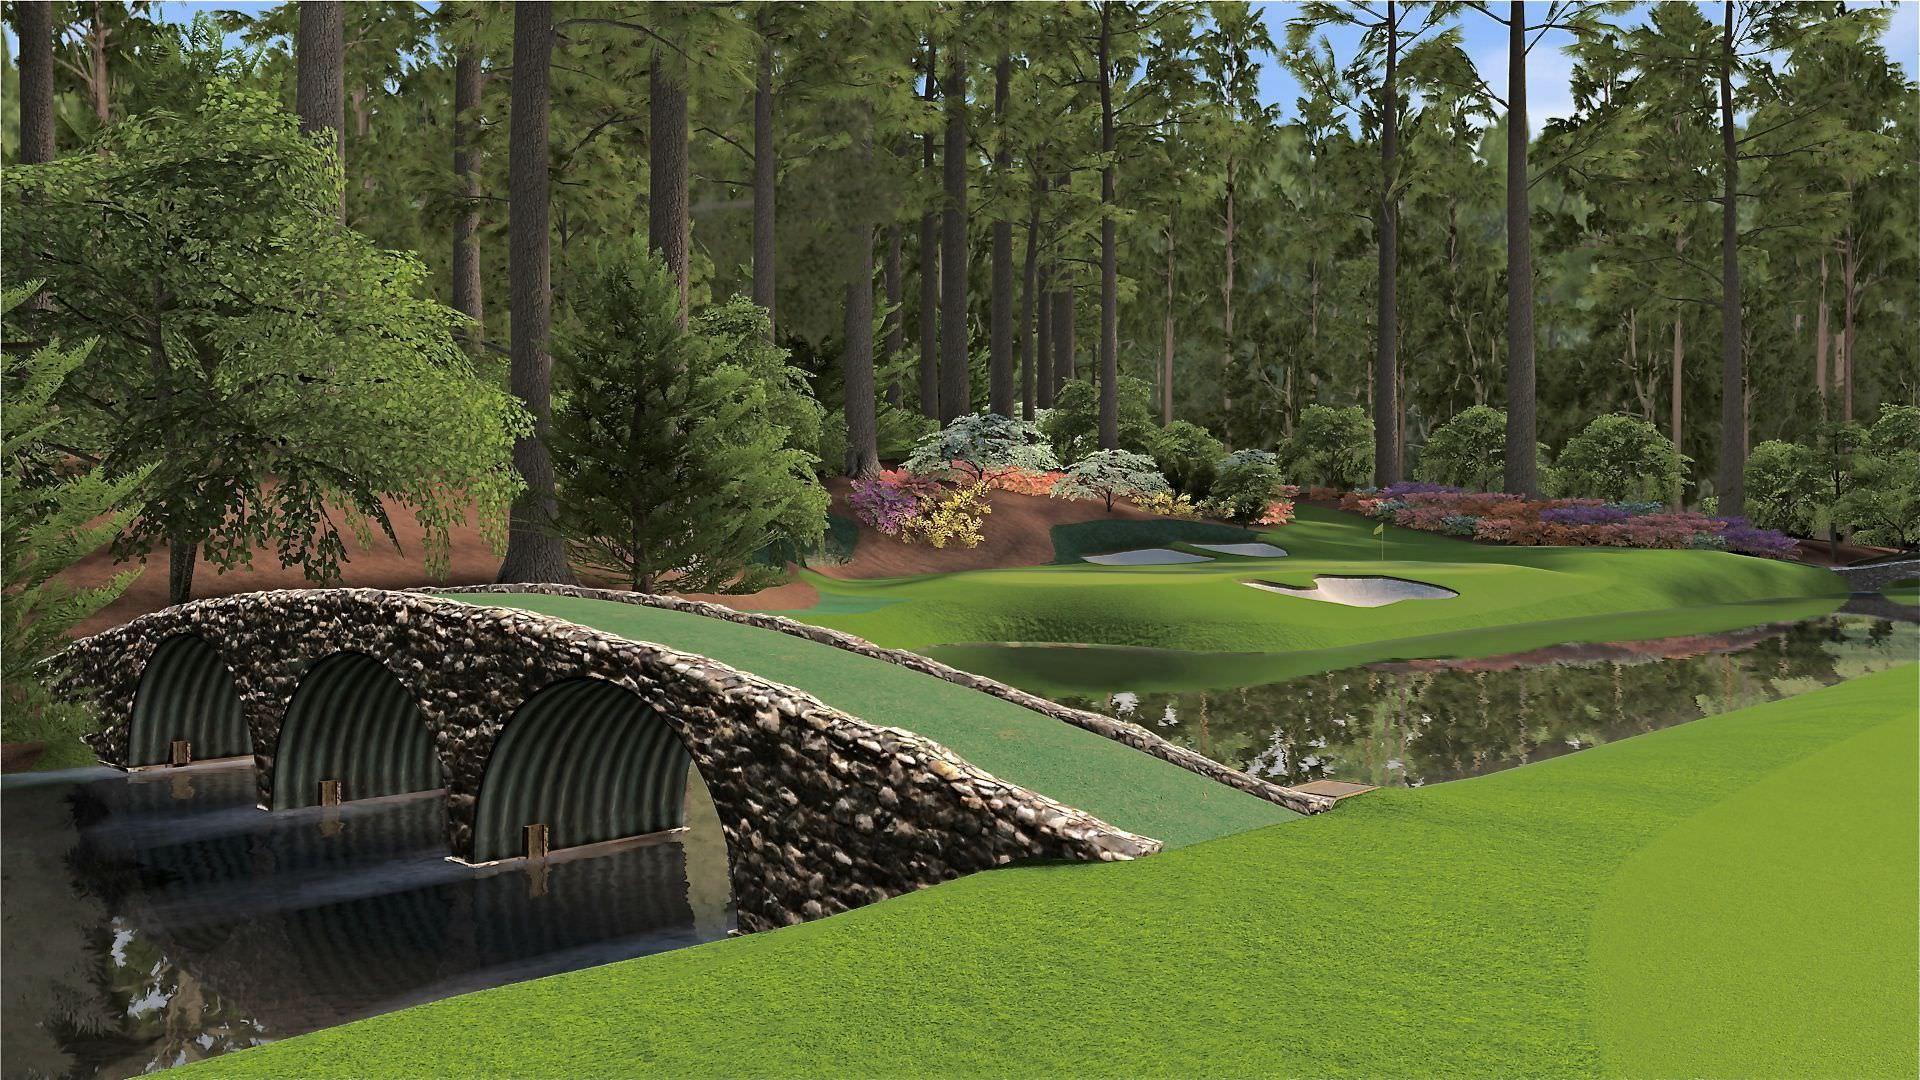 wallpaper.wiki-Augusta-National-Full-HD-Wallpaper-PIC-